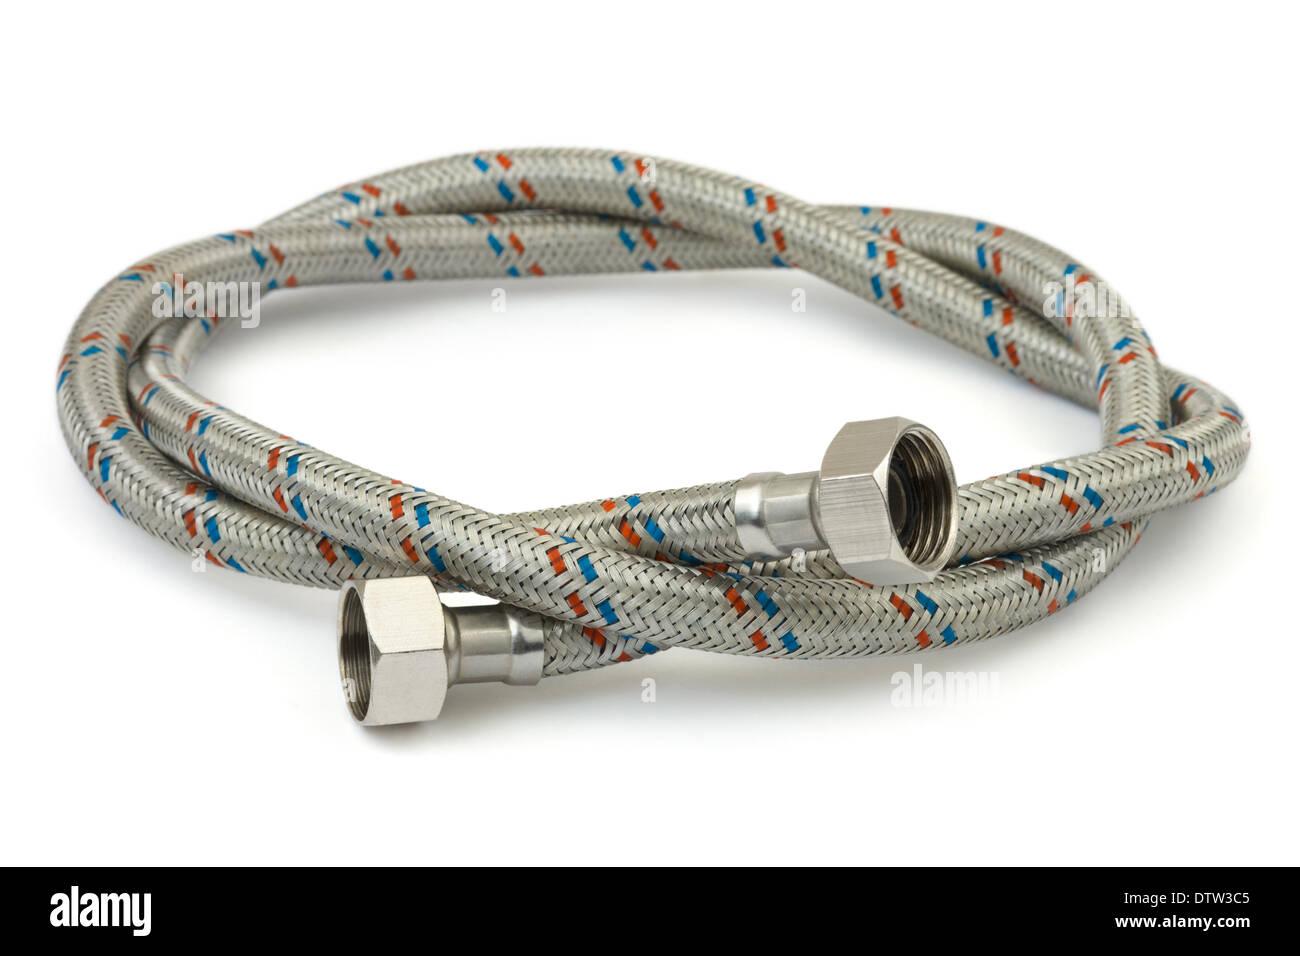 Water hose - Stock Image